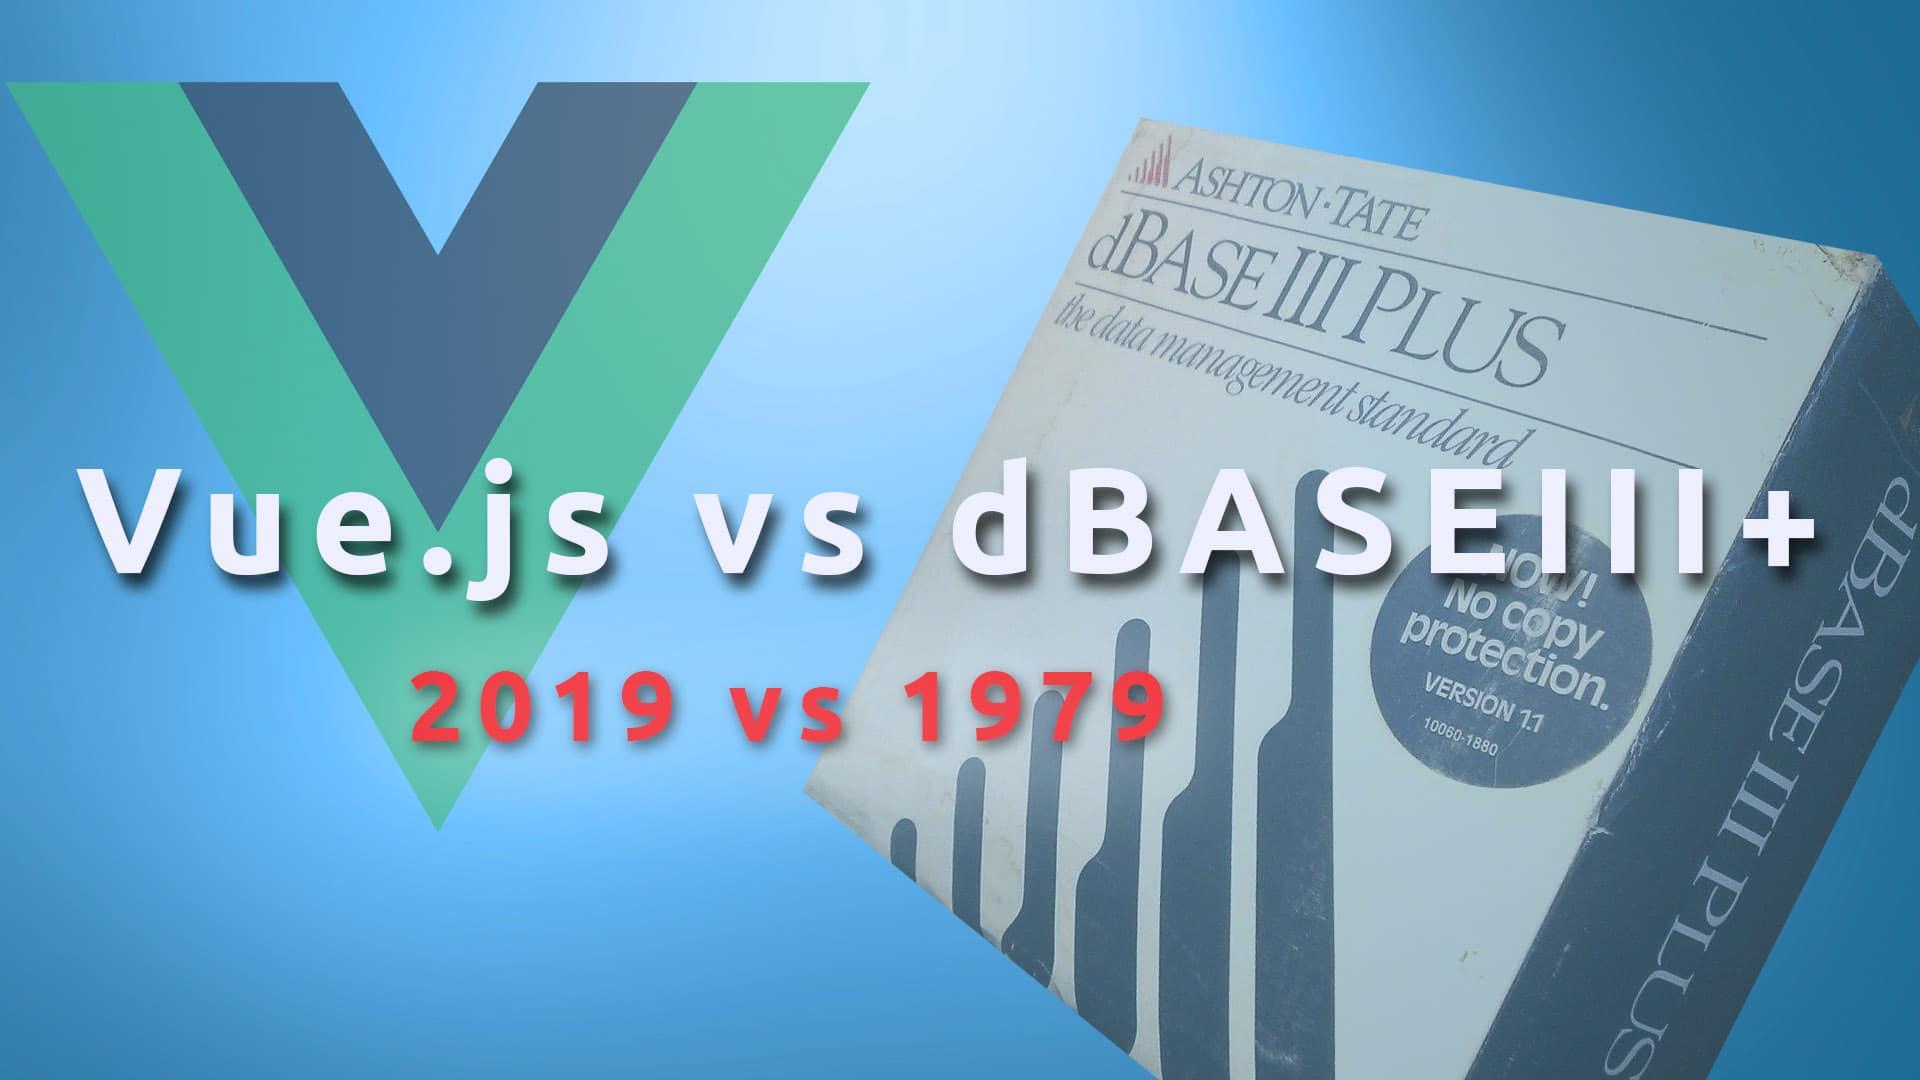 software development in 1979 and in 2019 / Vue.js vs dBaseIII+